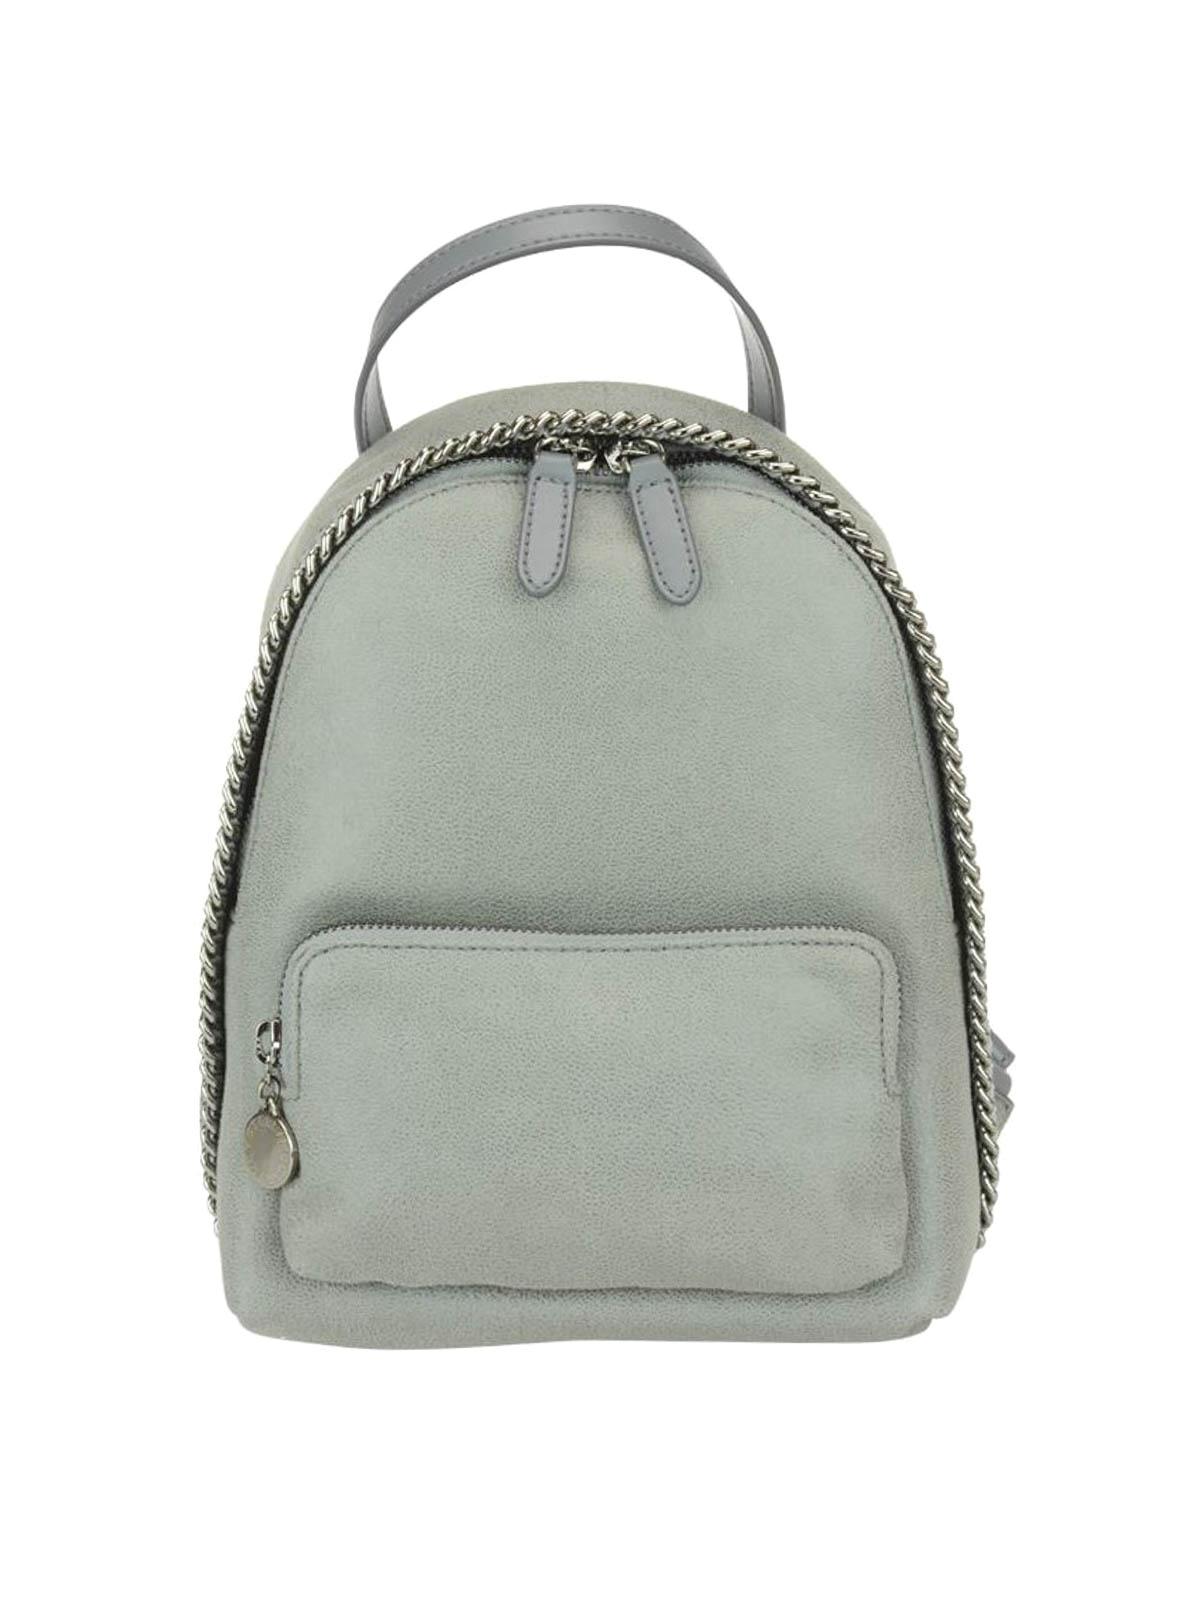 61cdcaa78c Stella Mccartney - Falabella light grey mini backpack - backpacks ...